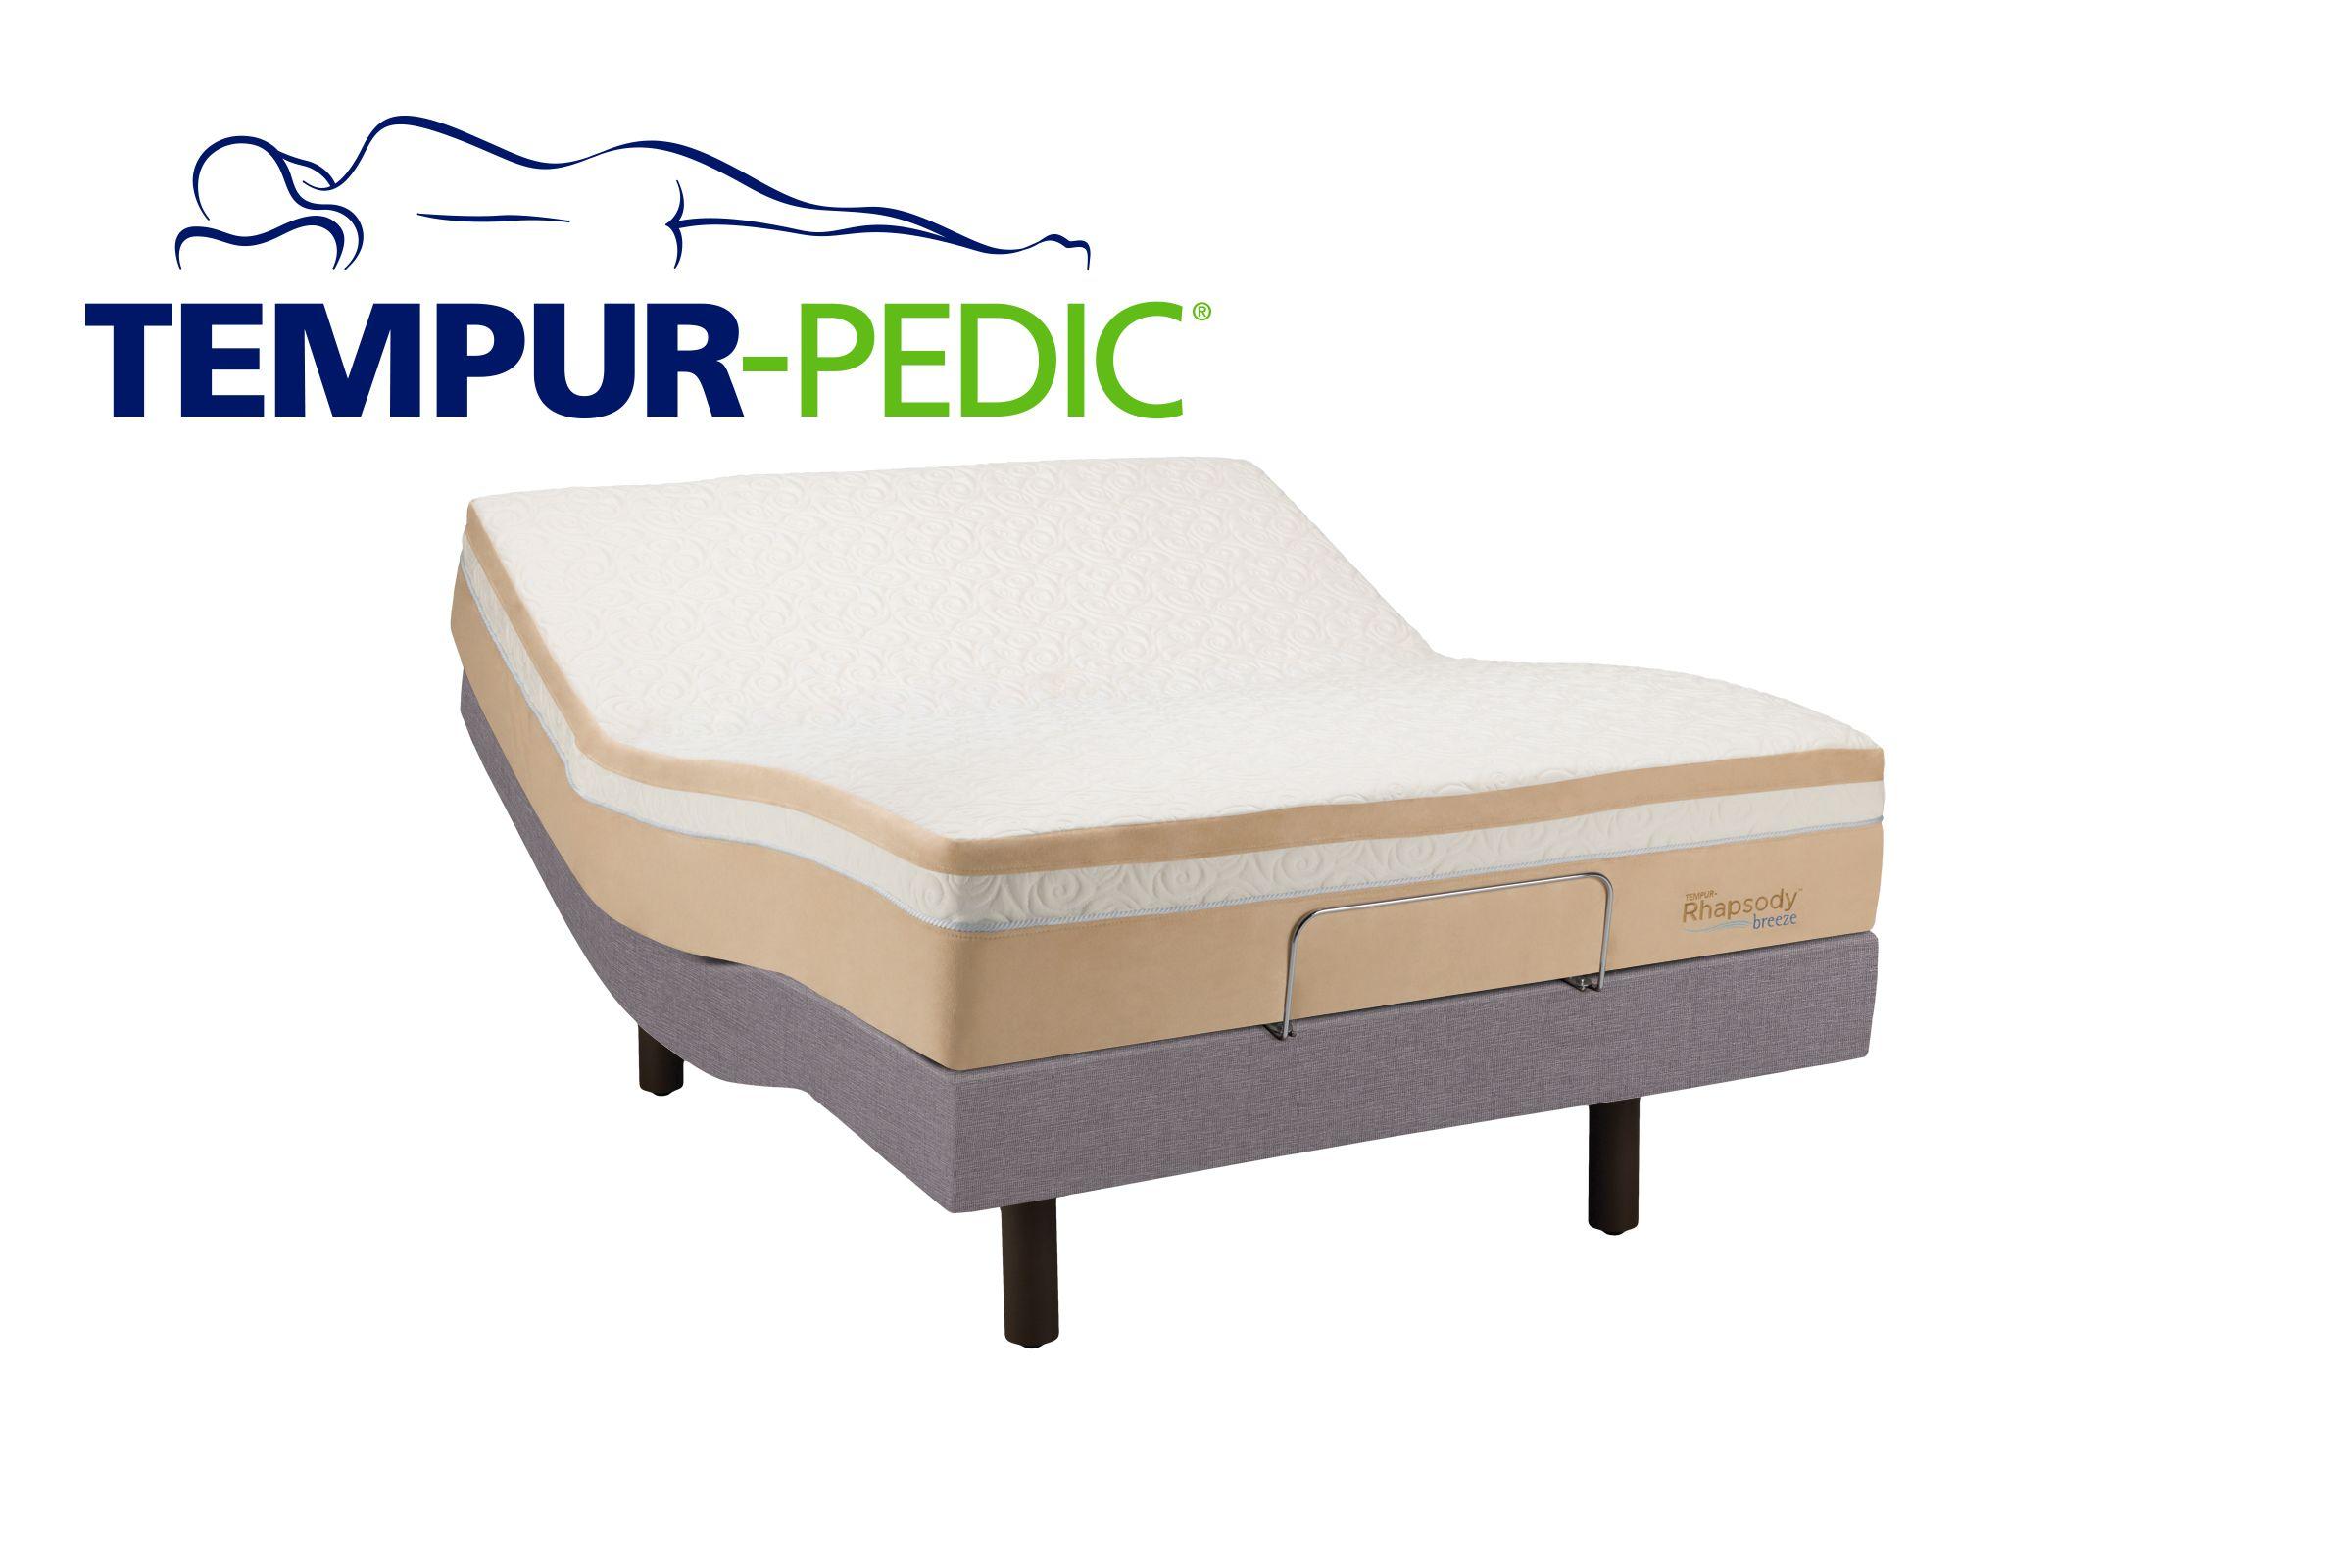 Tempurpedic Headboard Bracket Top Selected Products And